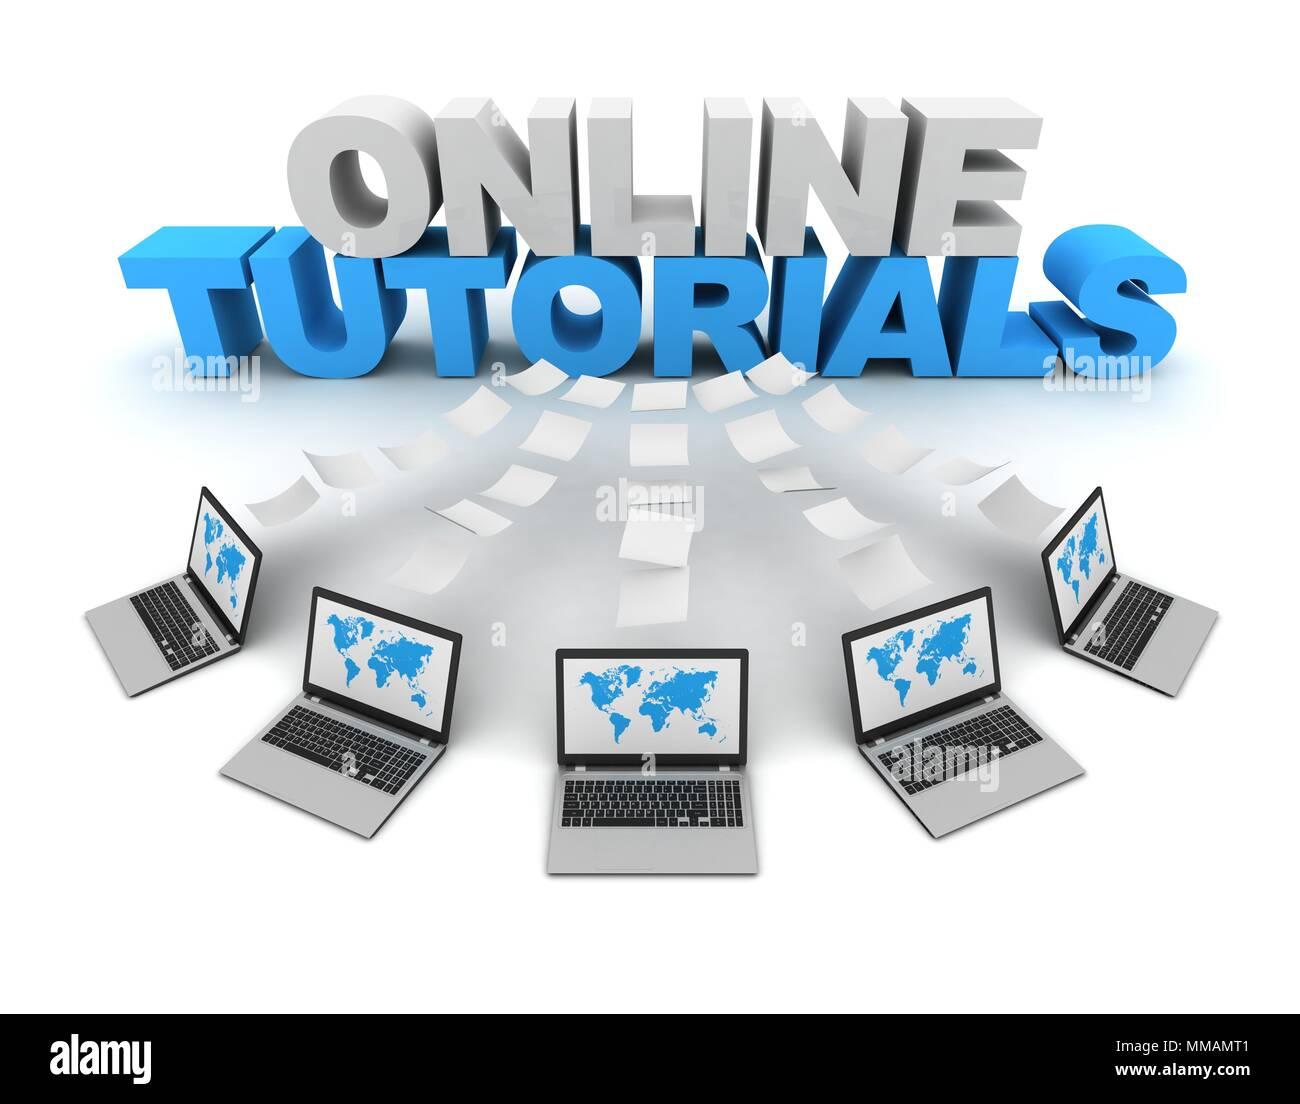 online tutorials 3d concept illustration - Stock Image